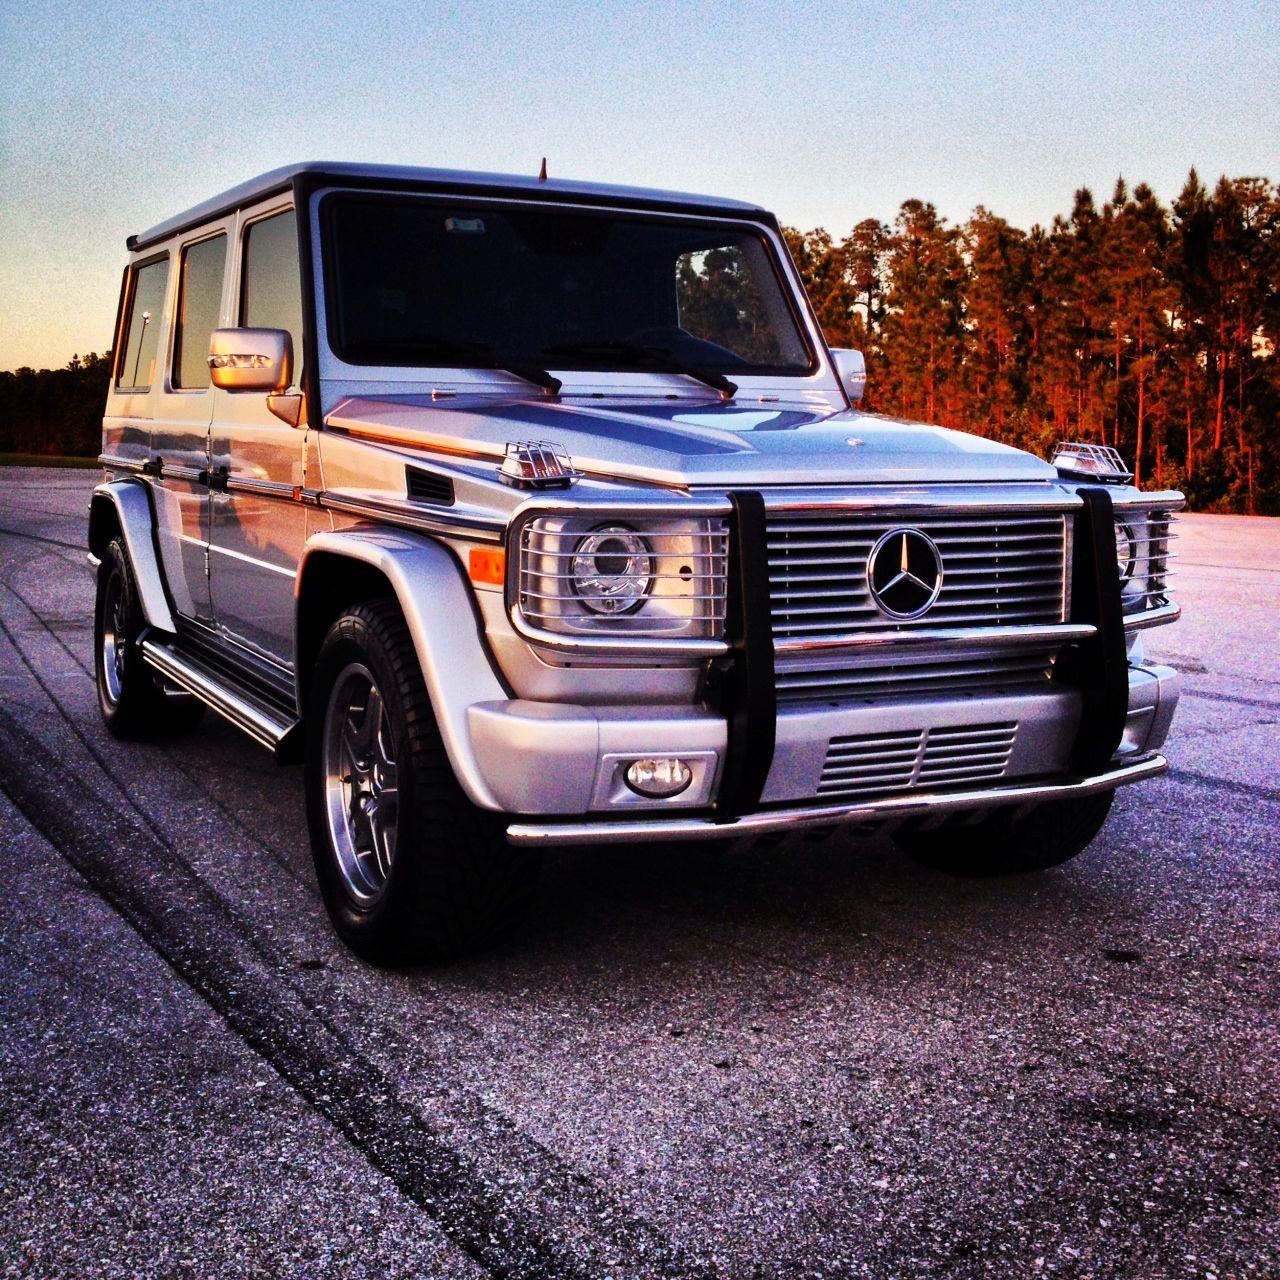 2008 Mercedes-Benz G55 AMG | Trucks | Pinterest | Mercedes benz ...